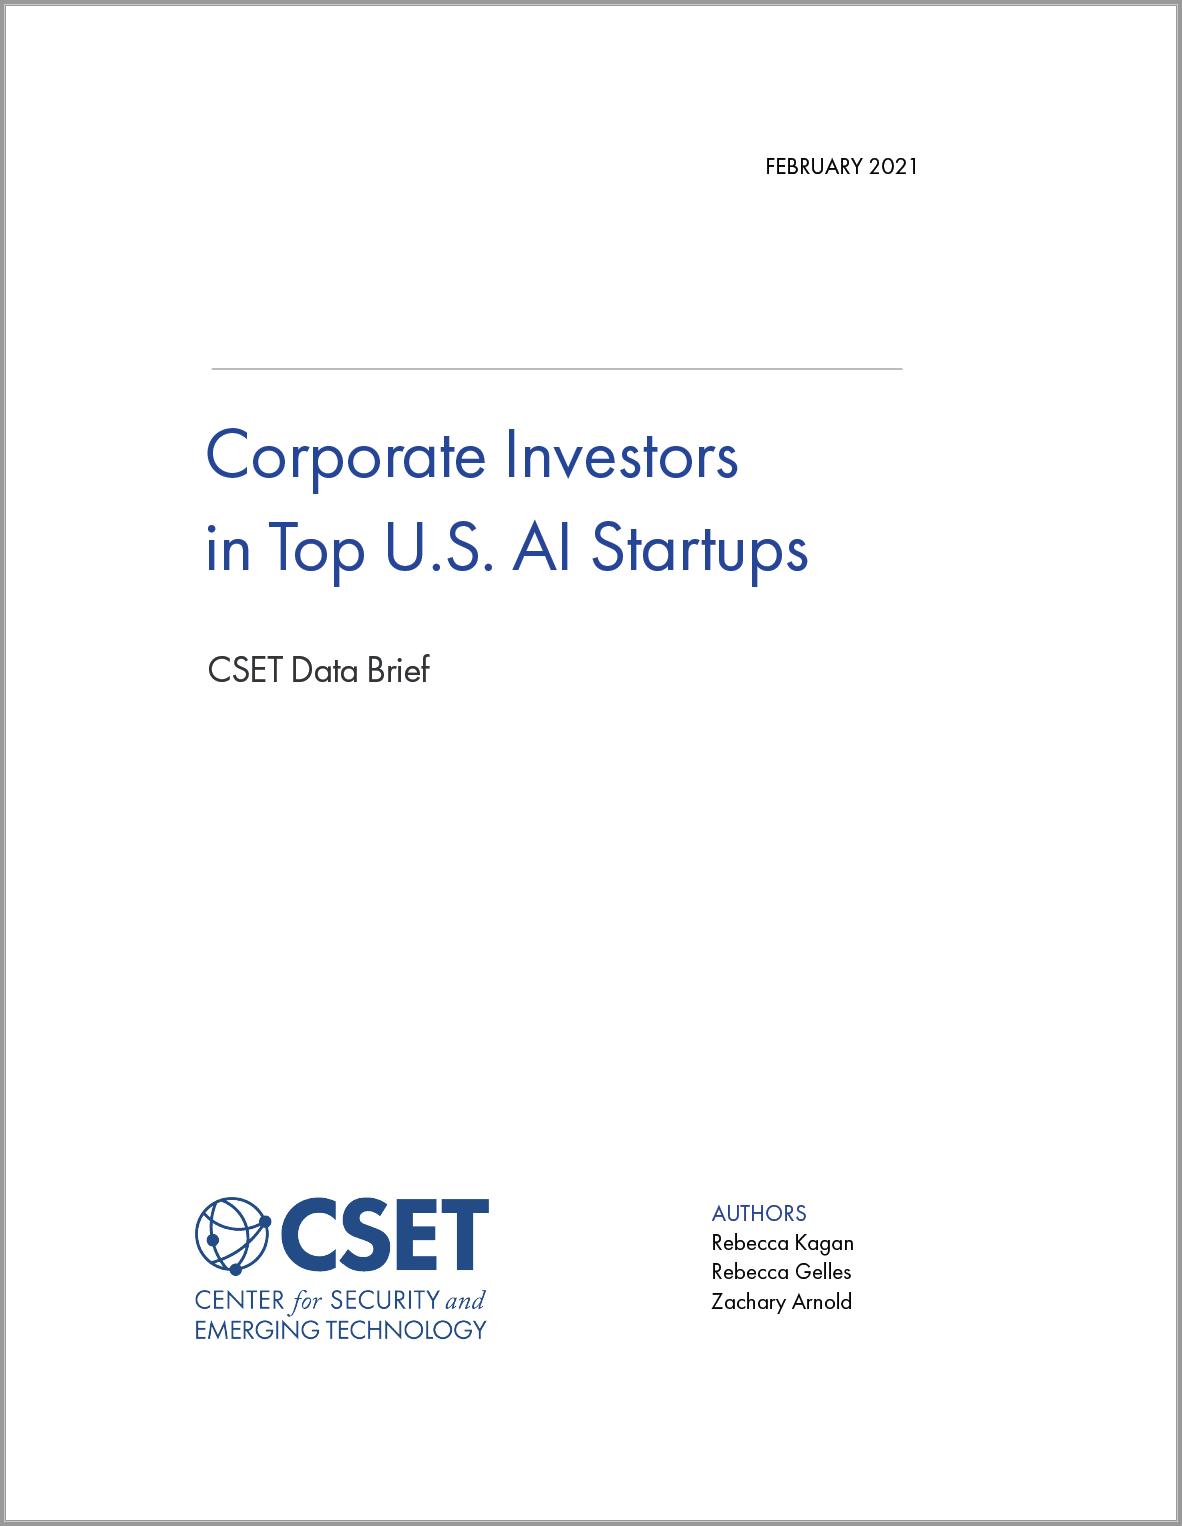 CSET - Corporate Investors in Top U.S. AI Startups Image